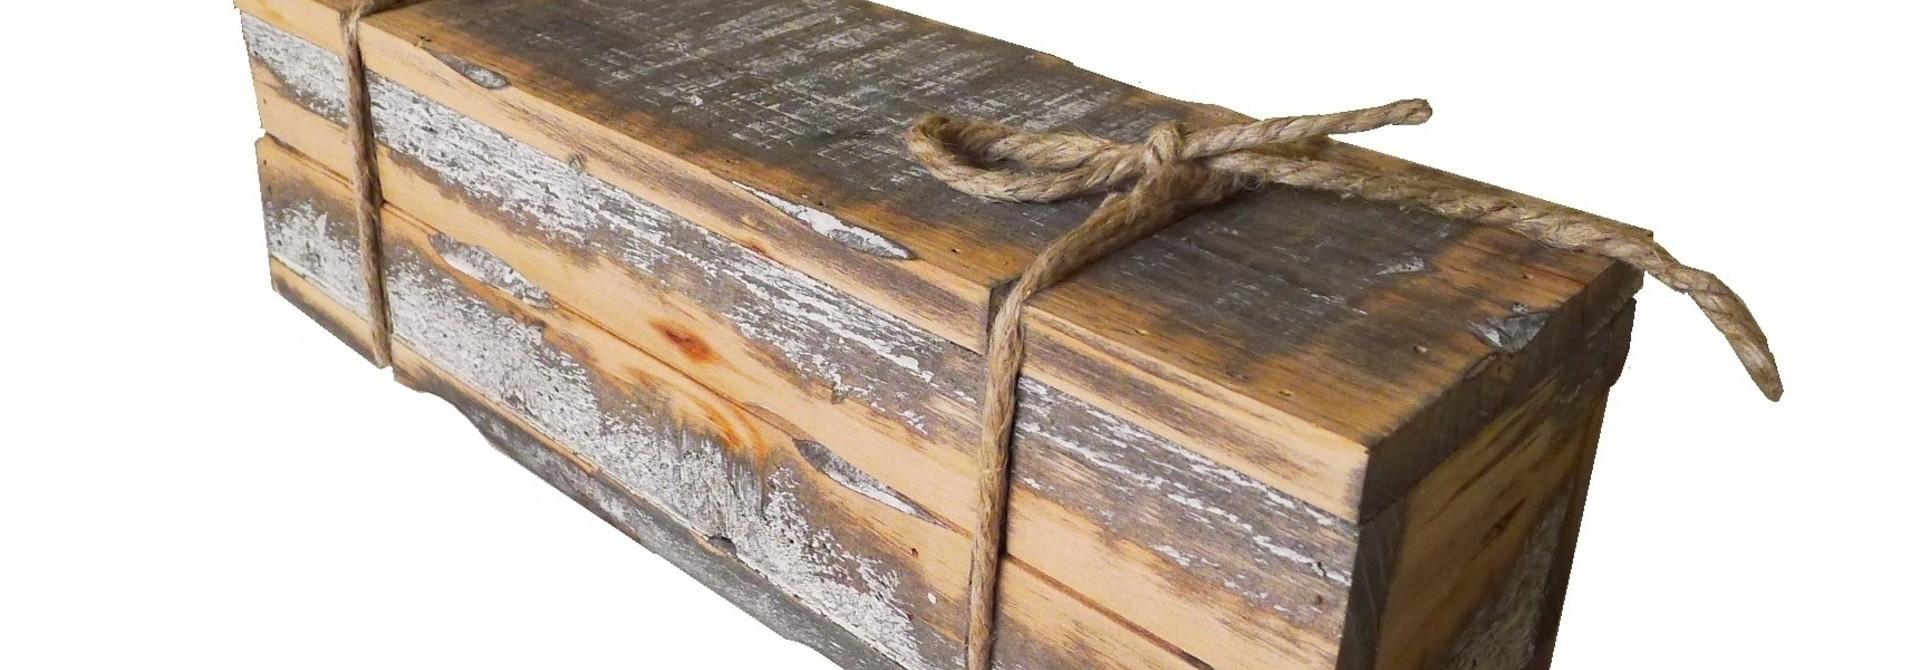 box old dutch wine 1B rope